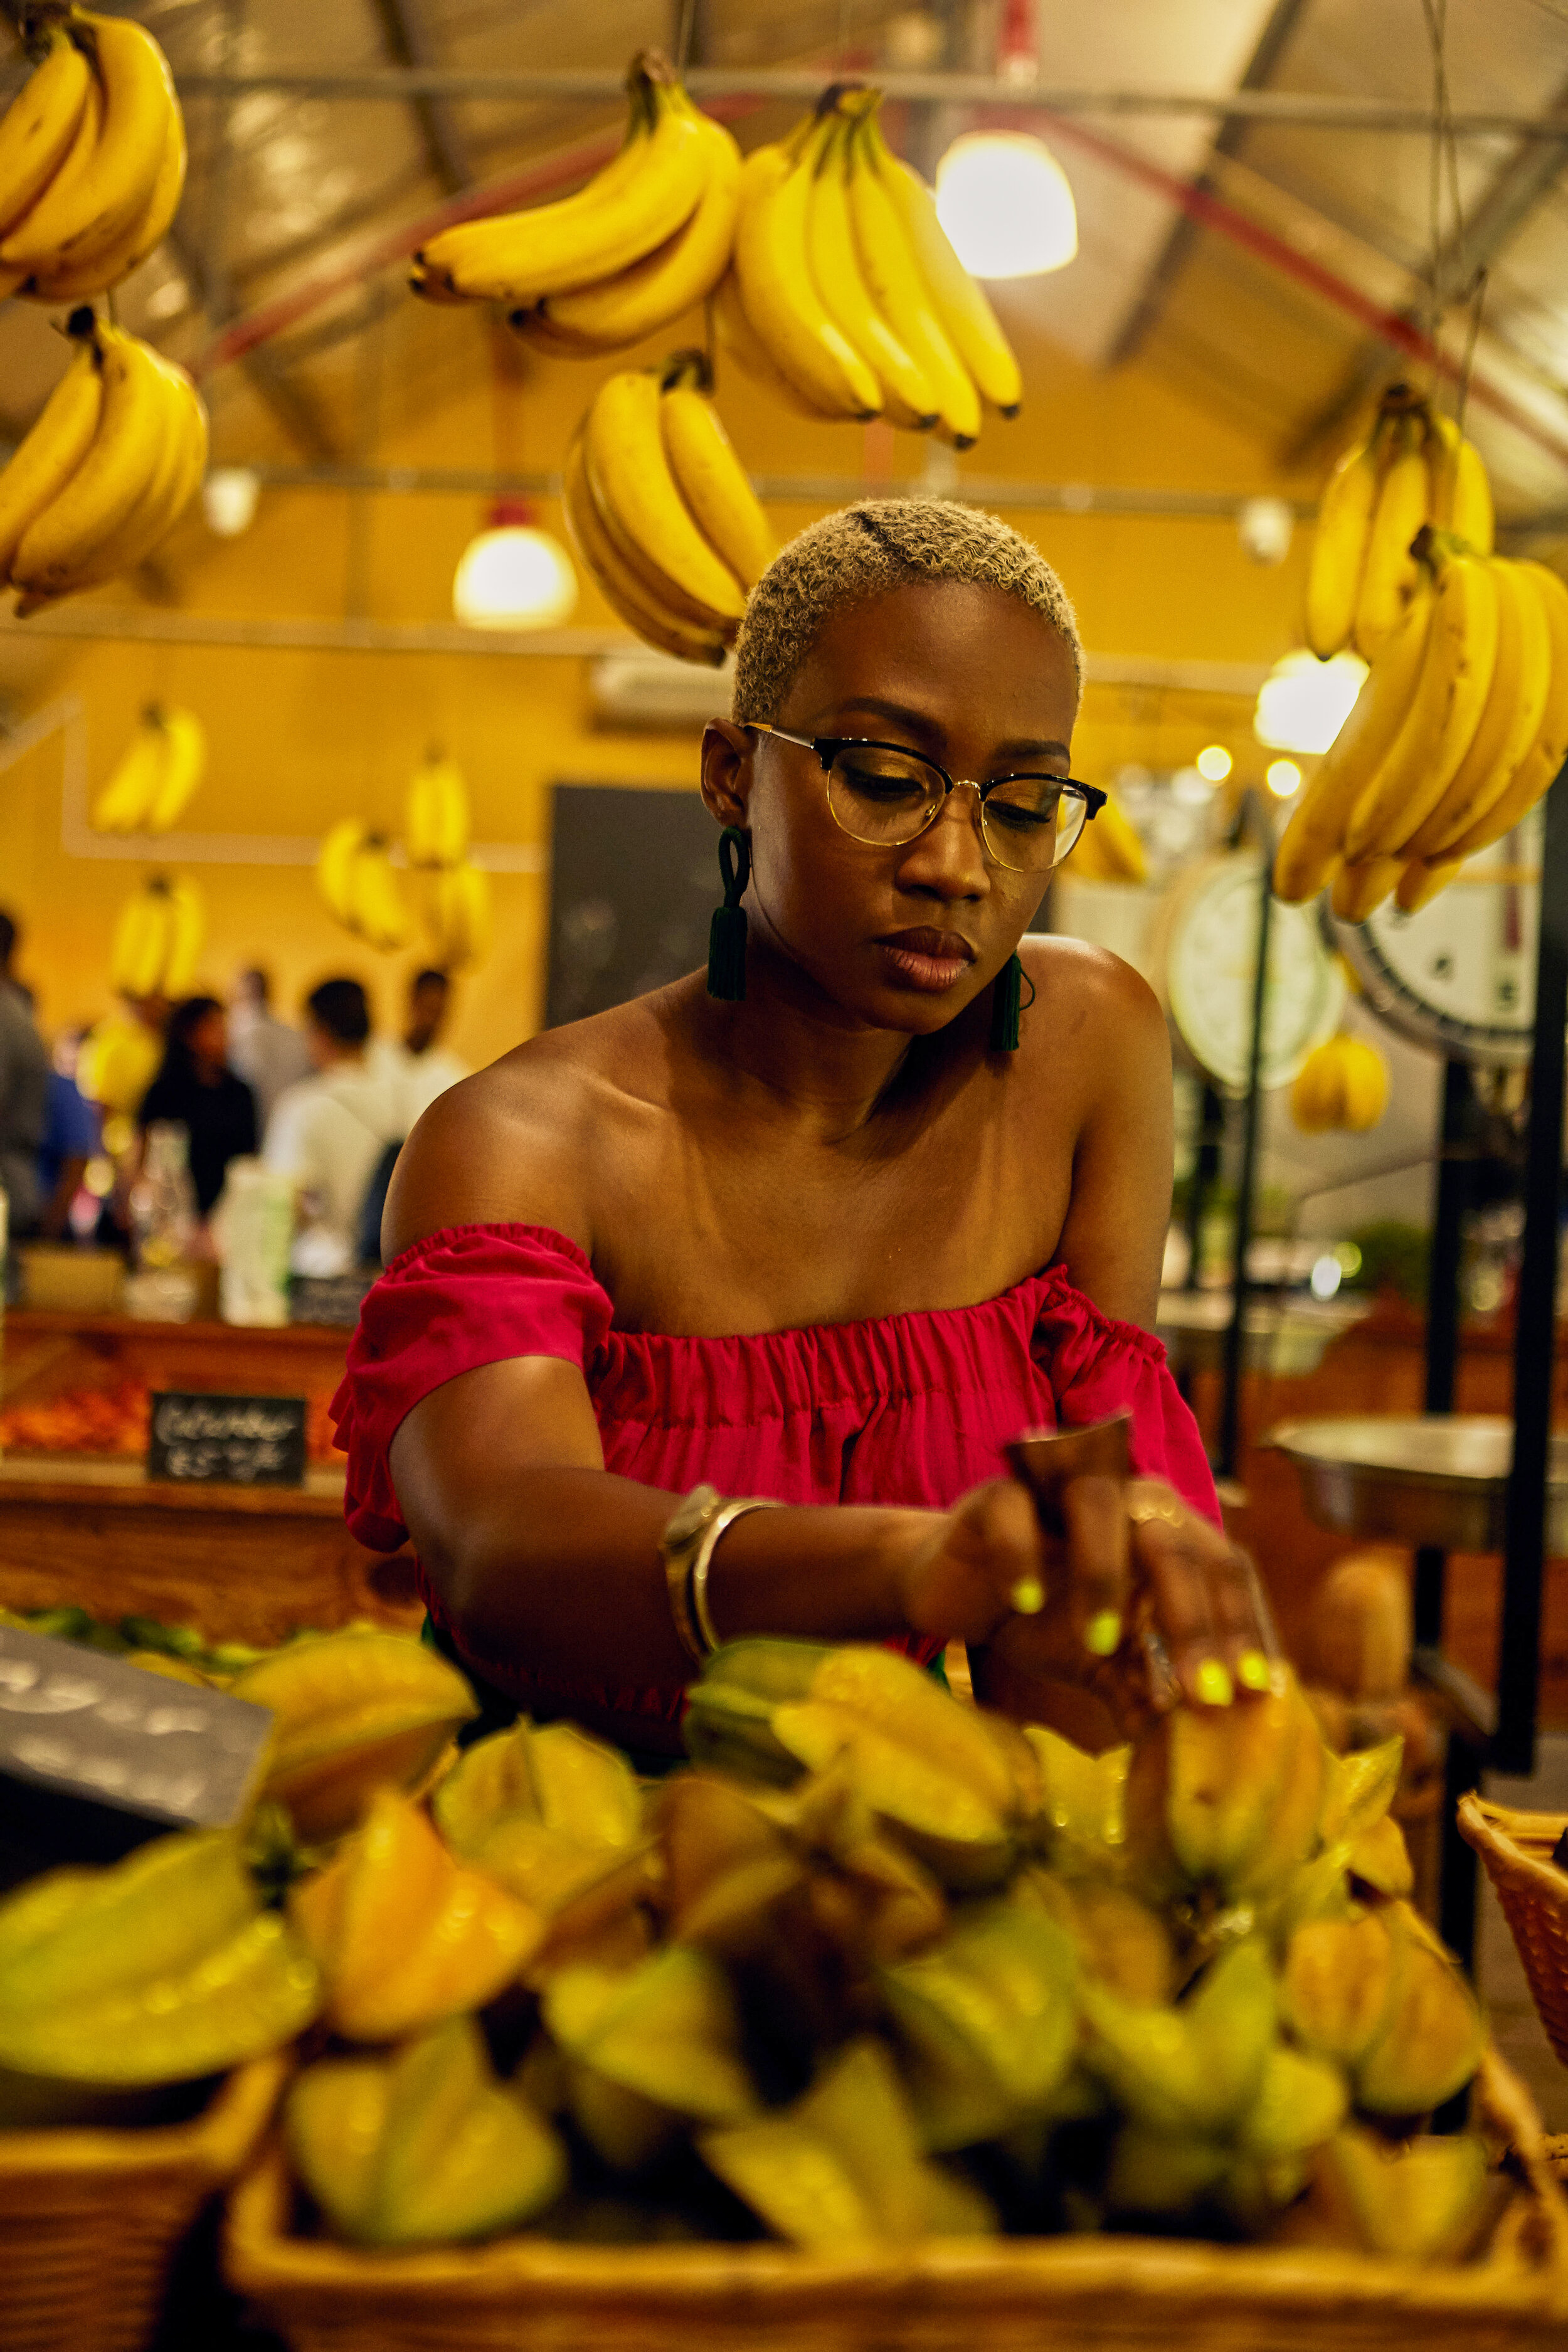 Marlon James_Designer Island_Portrait Afiya_UPick Cafe_19-08-10_018.jpg